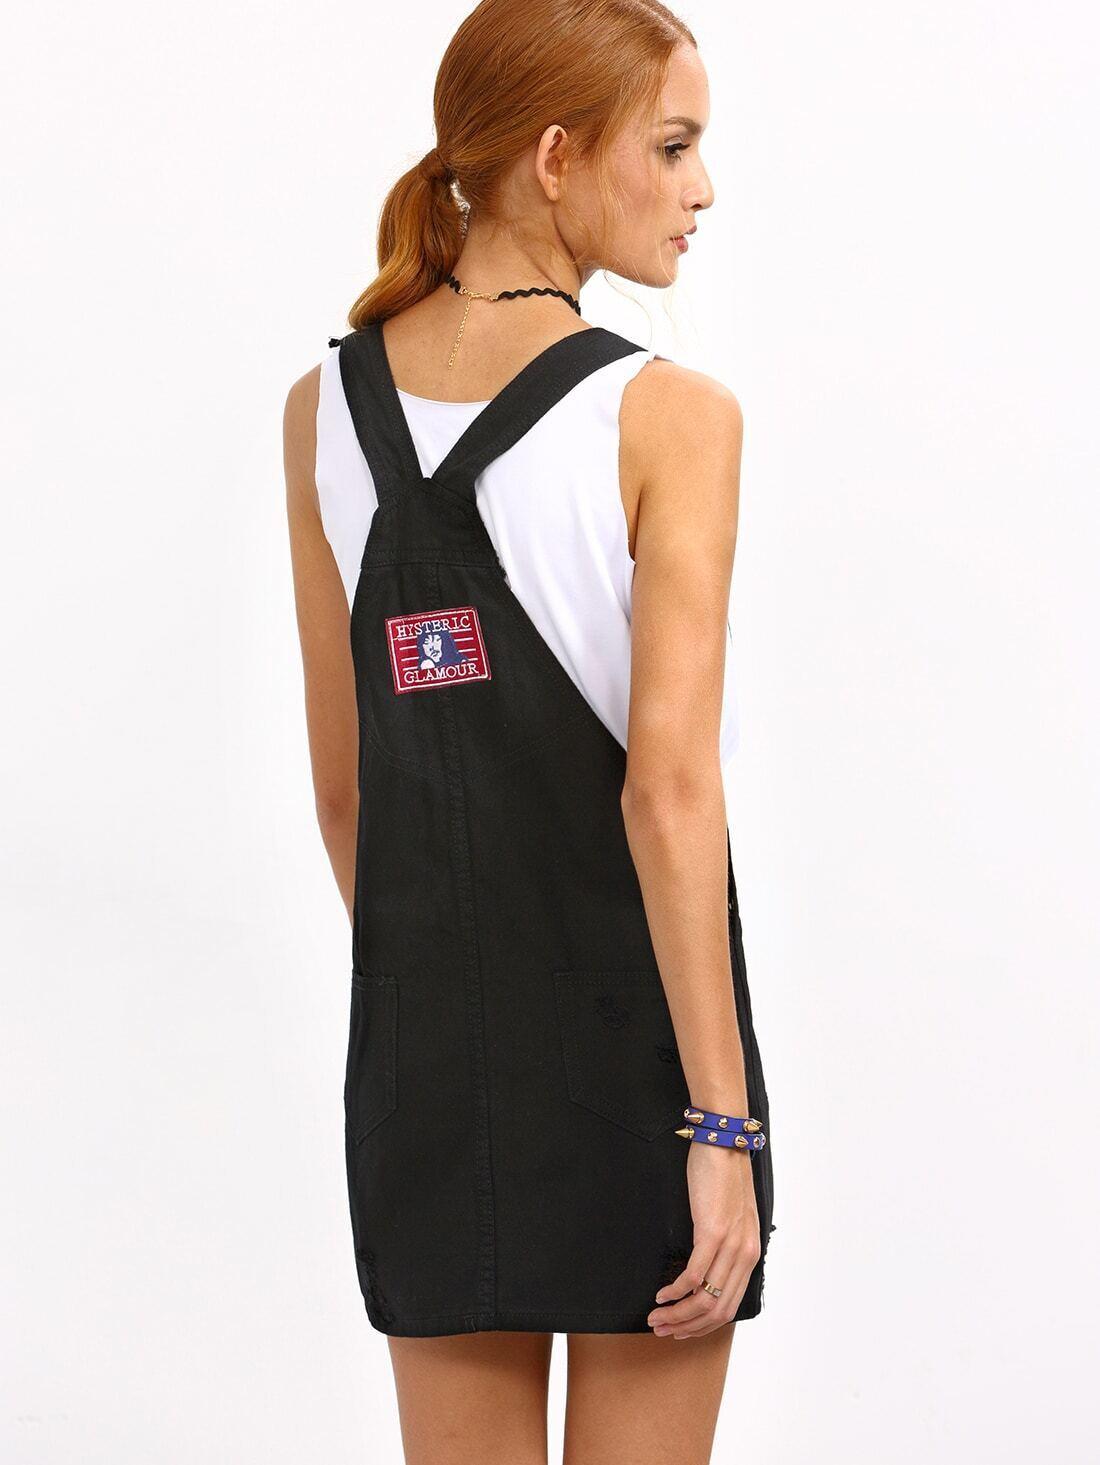 - Ripped Black Denim Overall Dress EmmaCloth-Women Fast Fashion Online